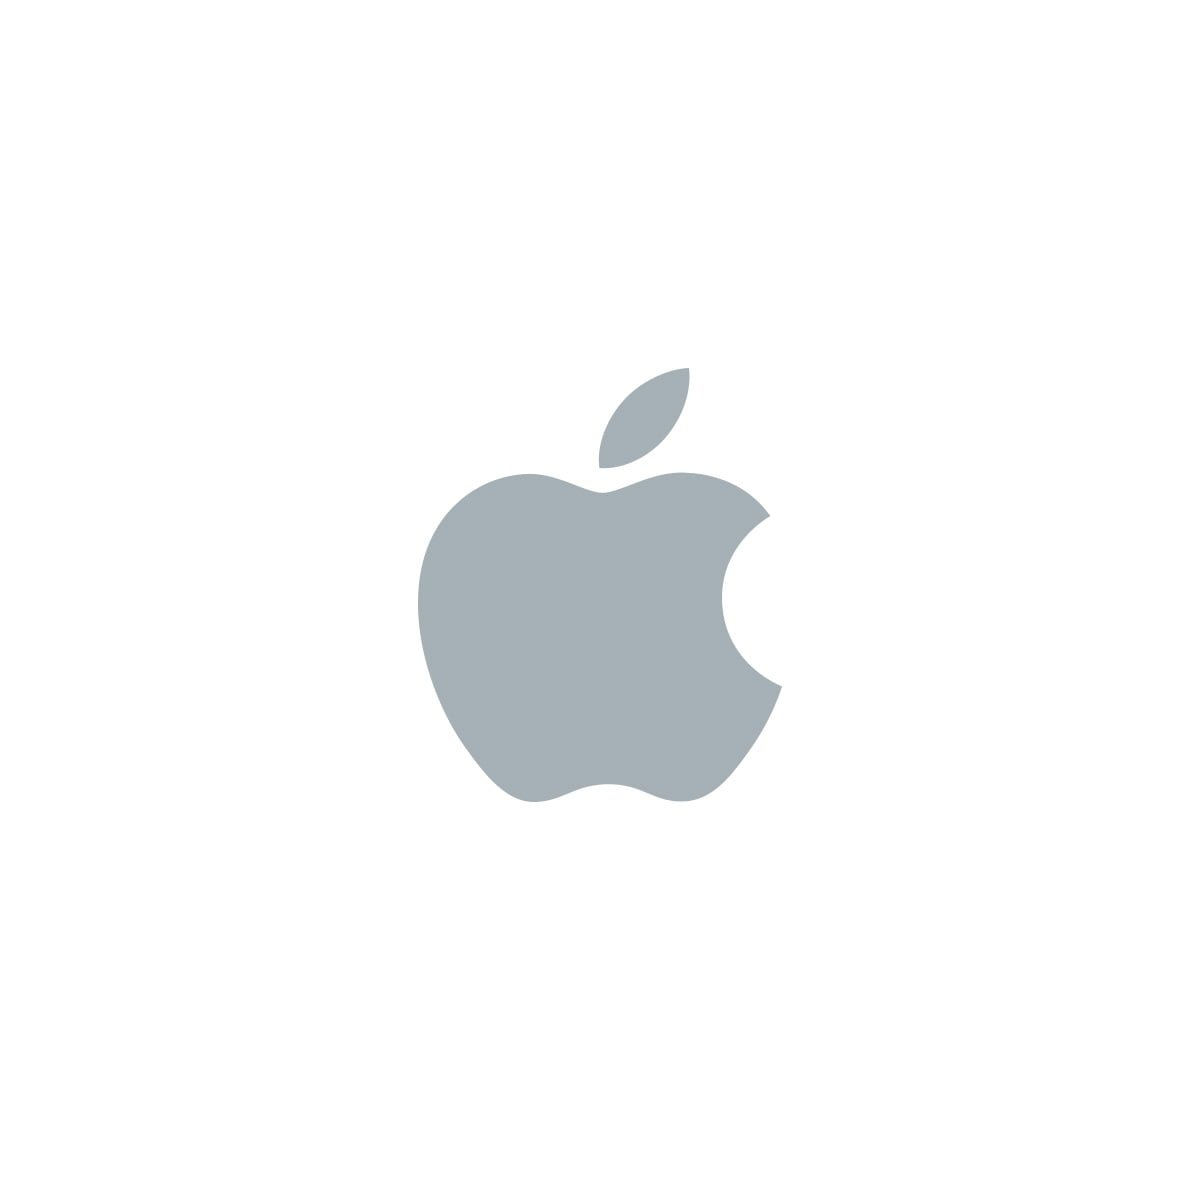 Apple-Logo-Technology-Beautiful-Design